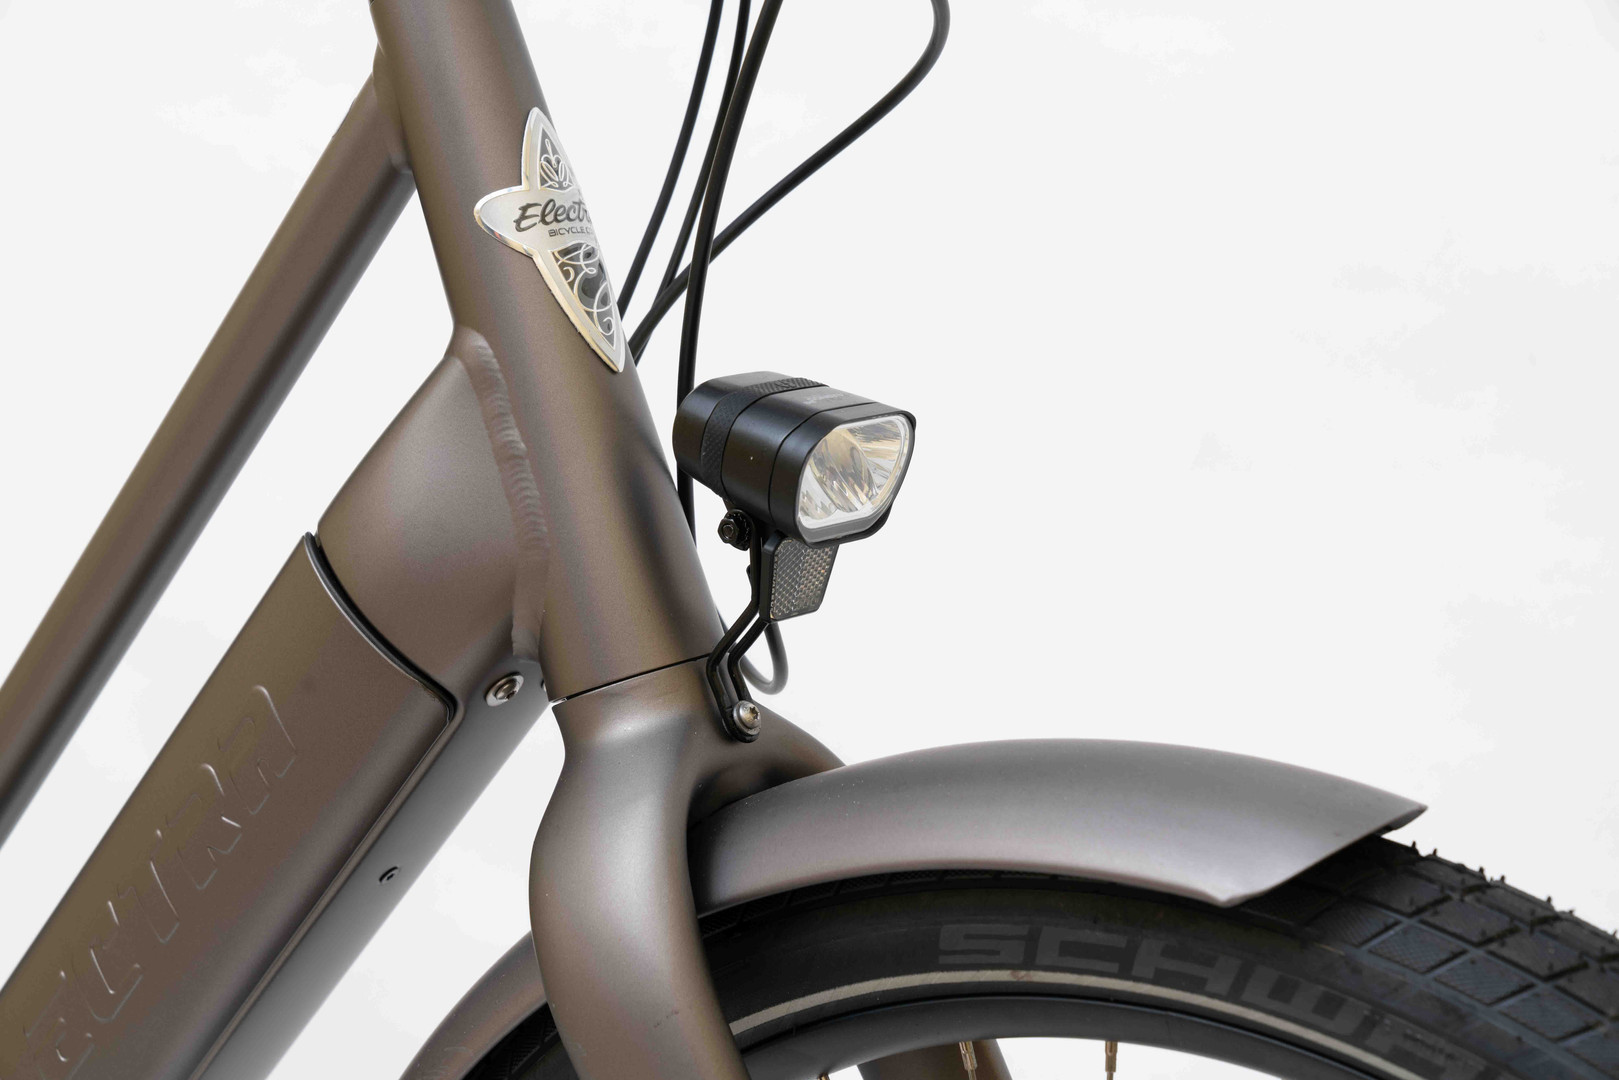 Fahrradladen_Pforzheim_Simoes_Bikes_103.